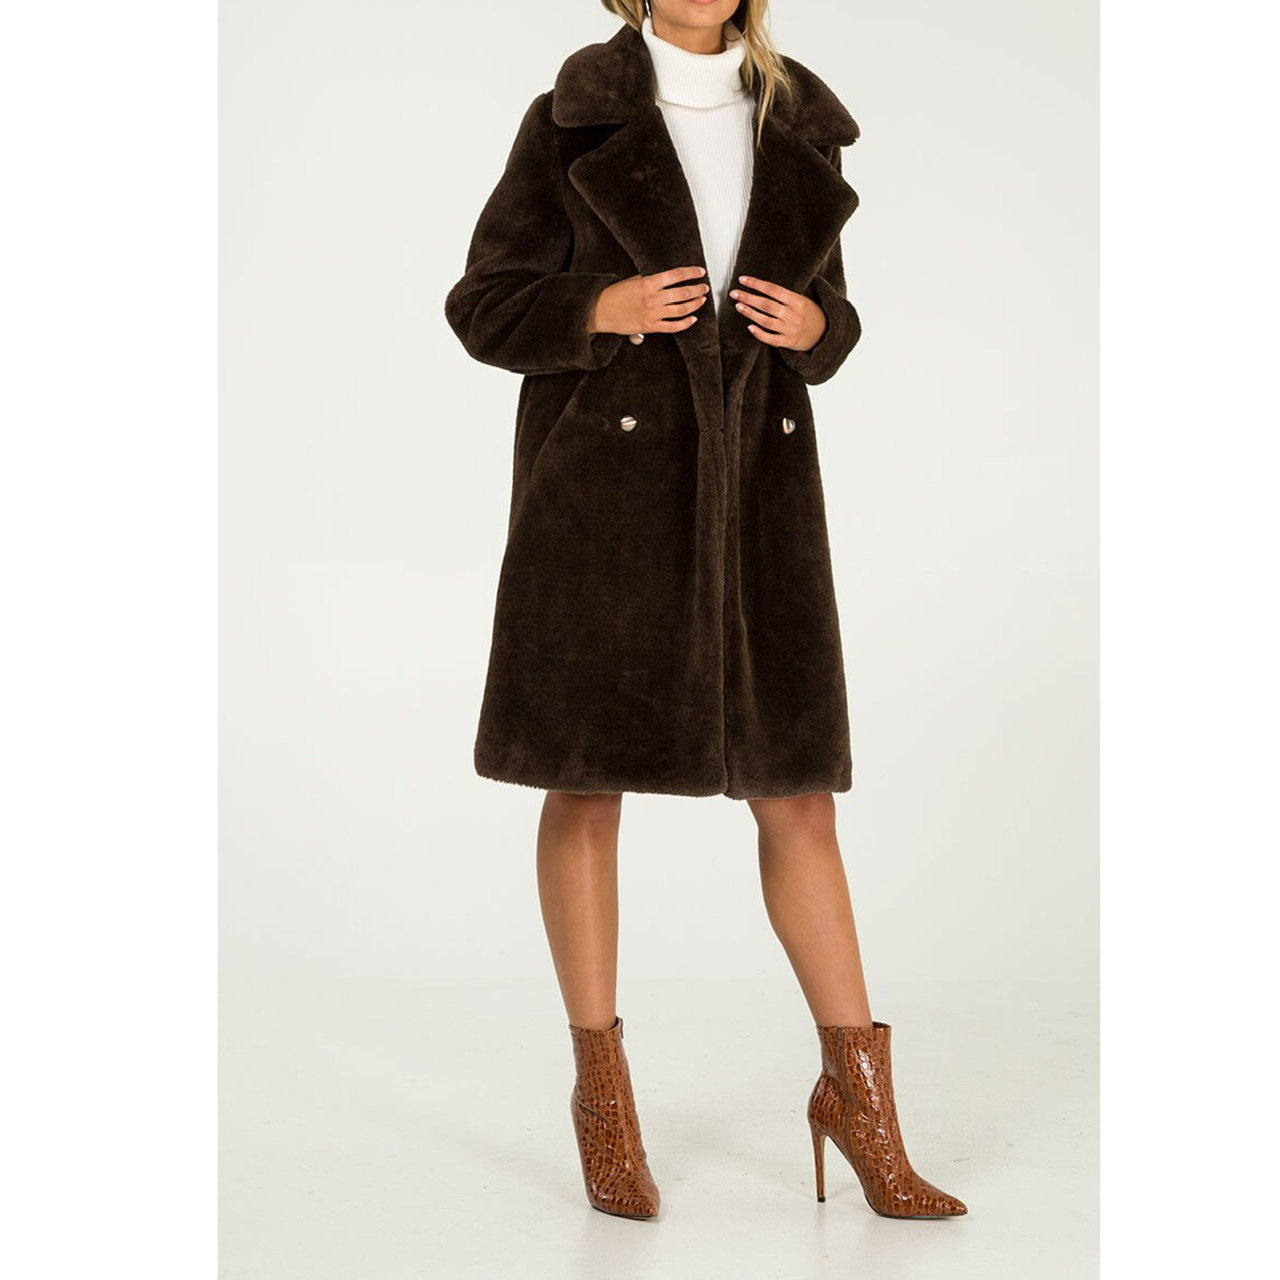 Chocolate faux fur coat